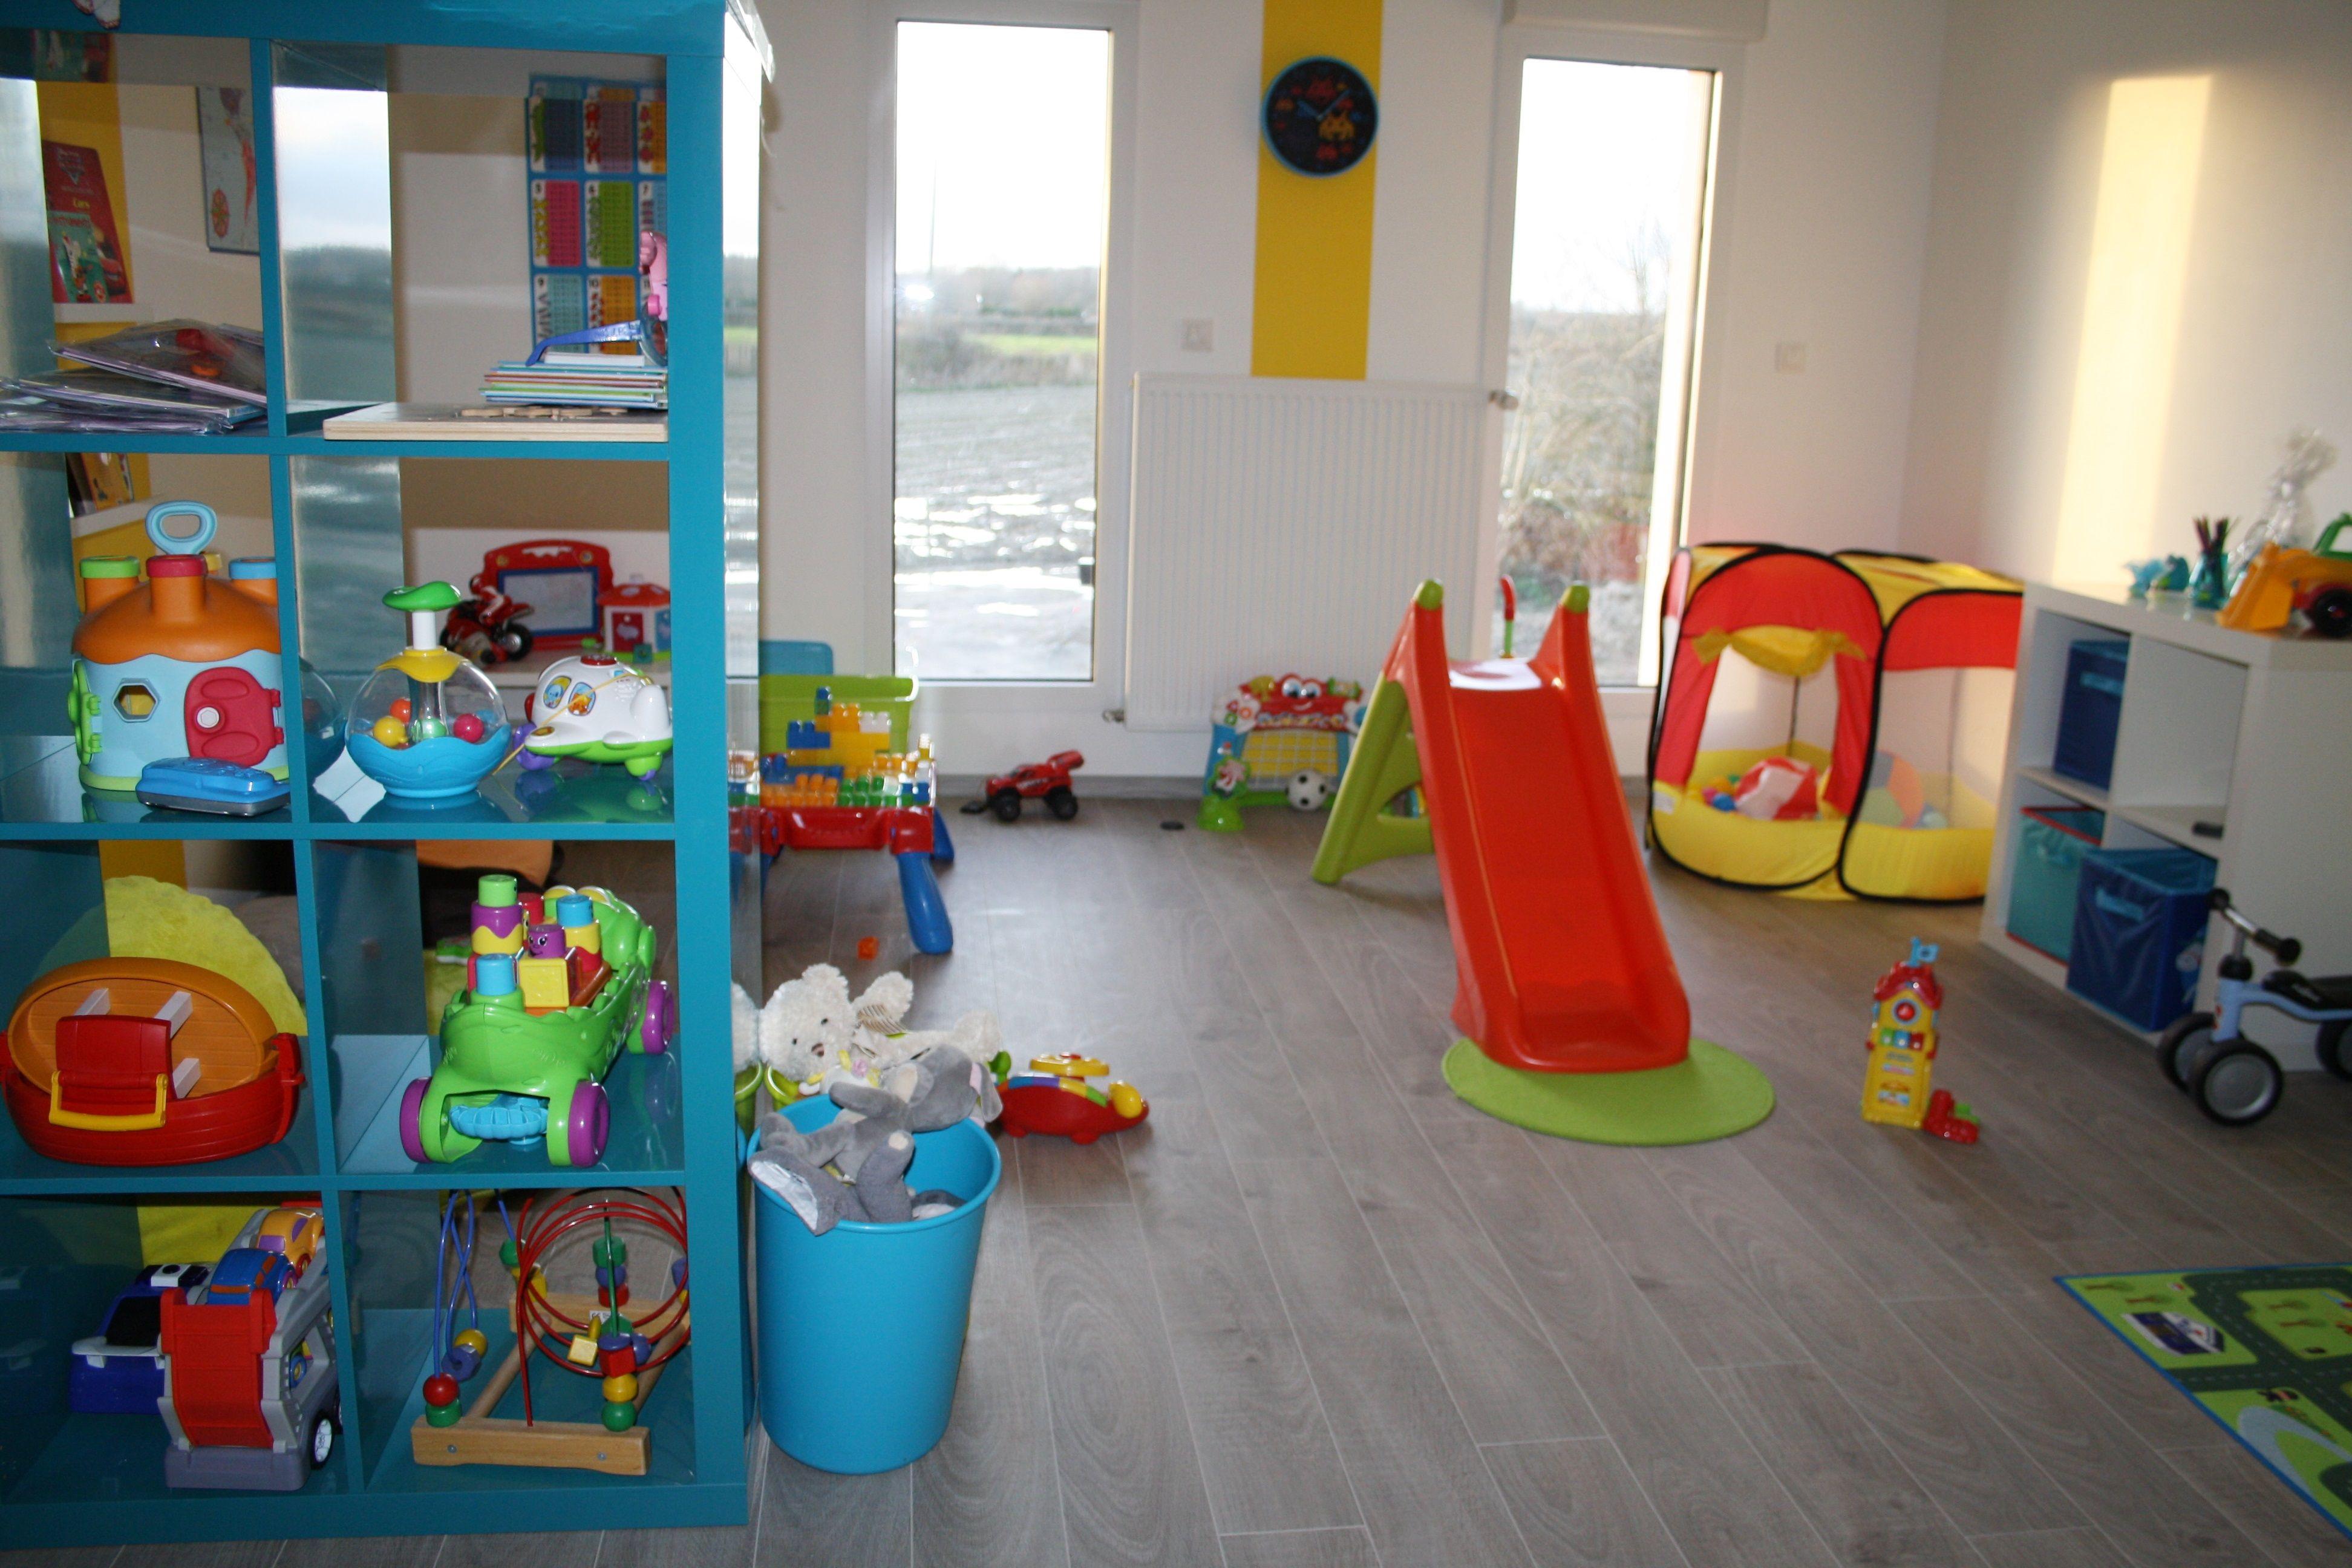 salle de jeux b u00e9b u00e9  kids world  playroom